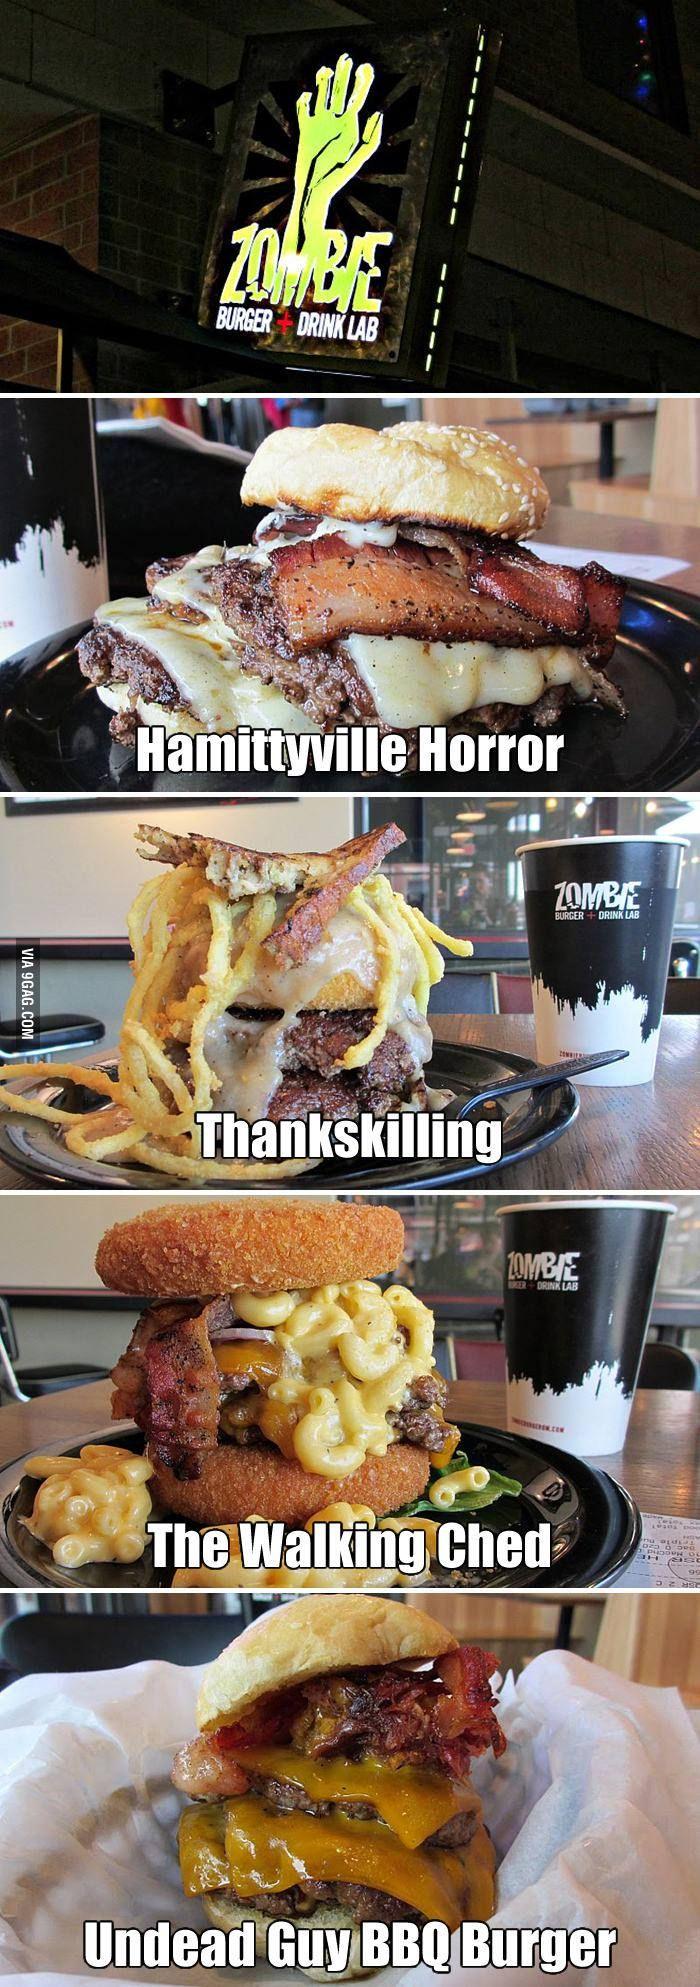 Zombie Burger on 9Gag